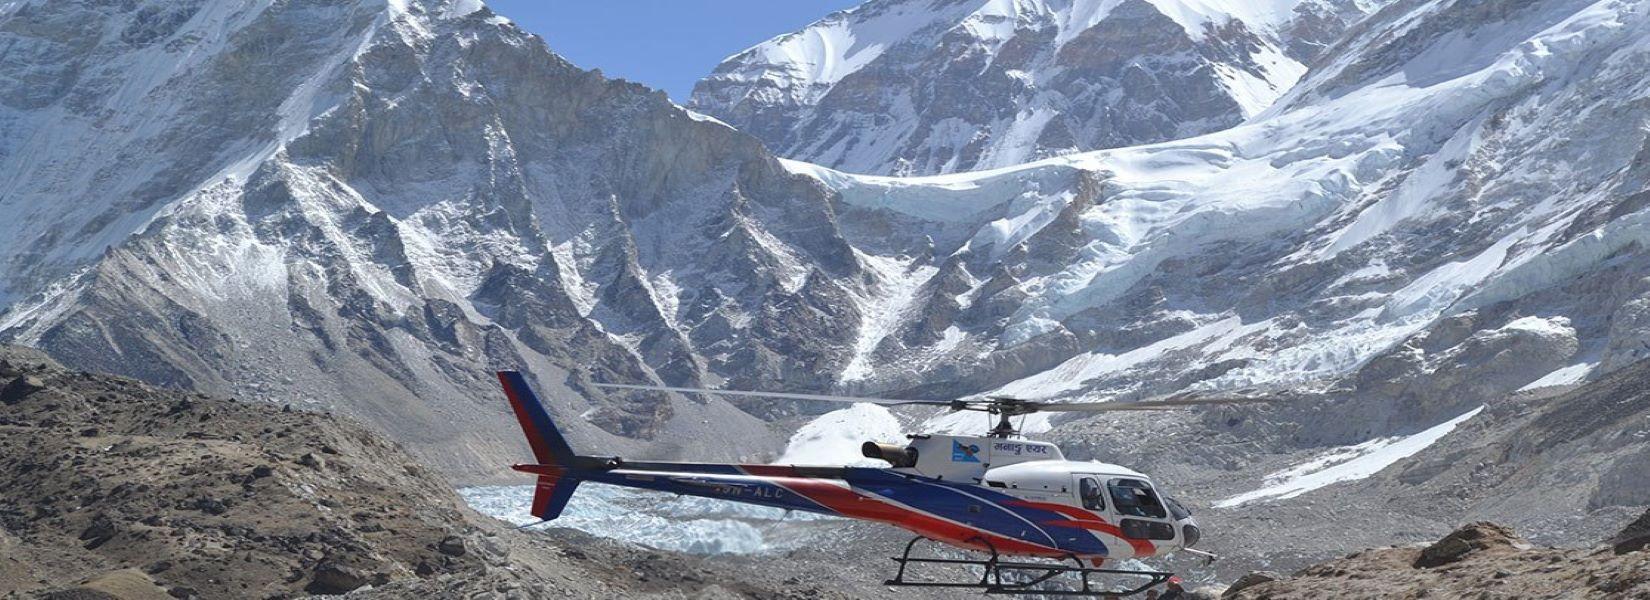 Everest Base Camp-Gokyo Short Heli Trekking